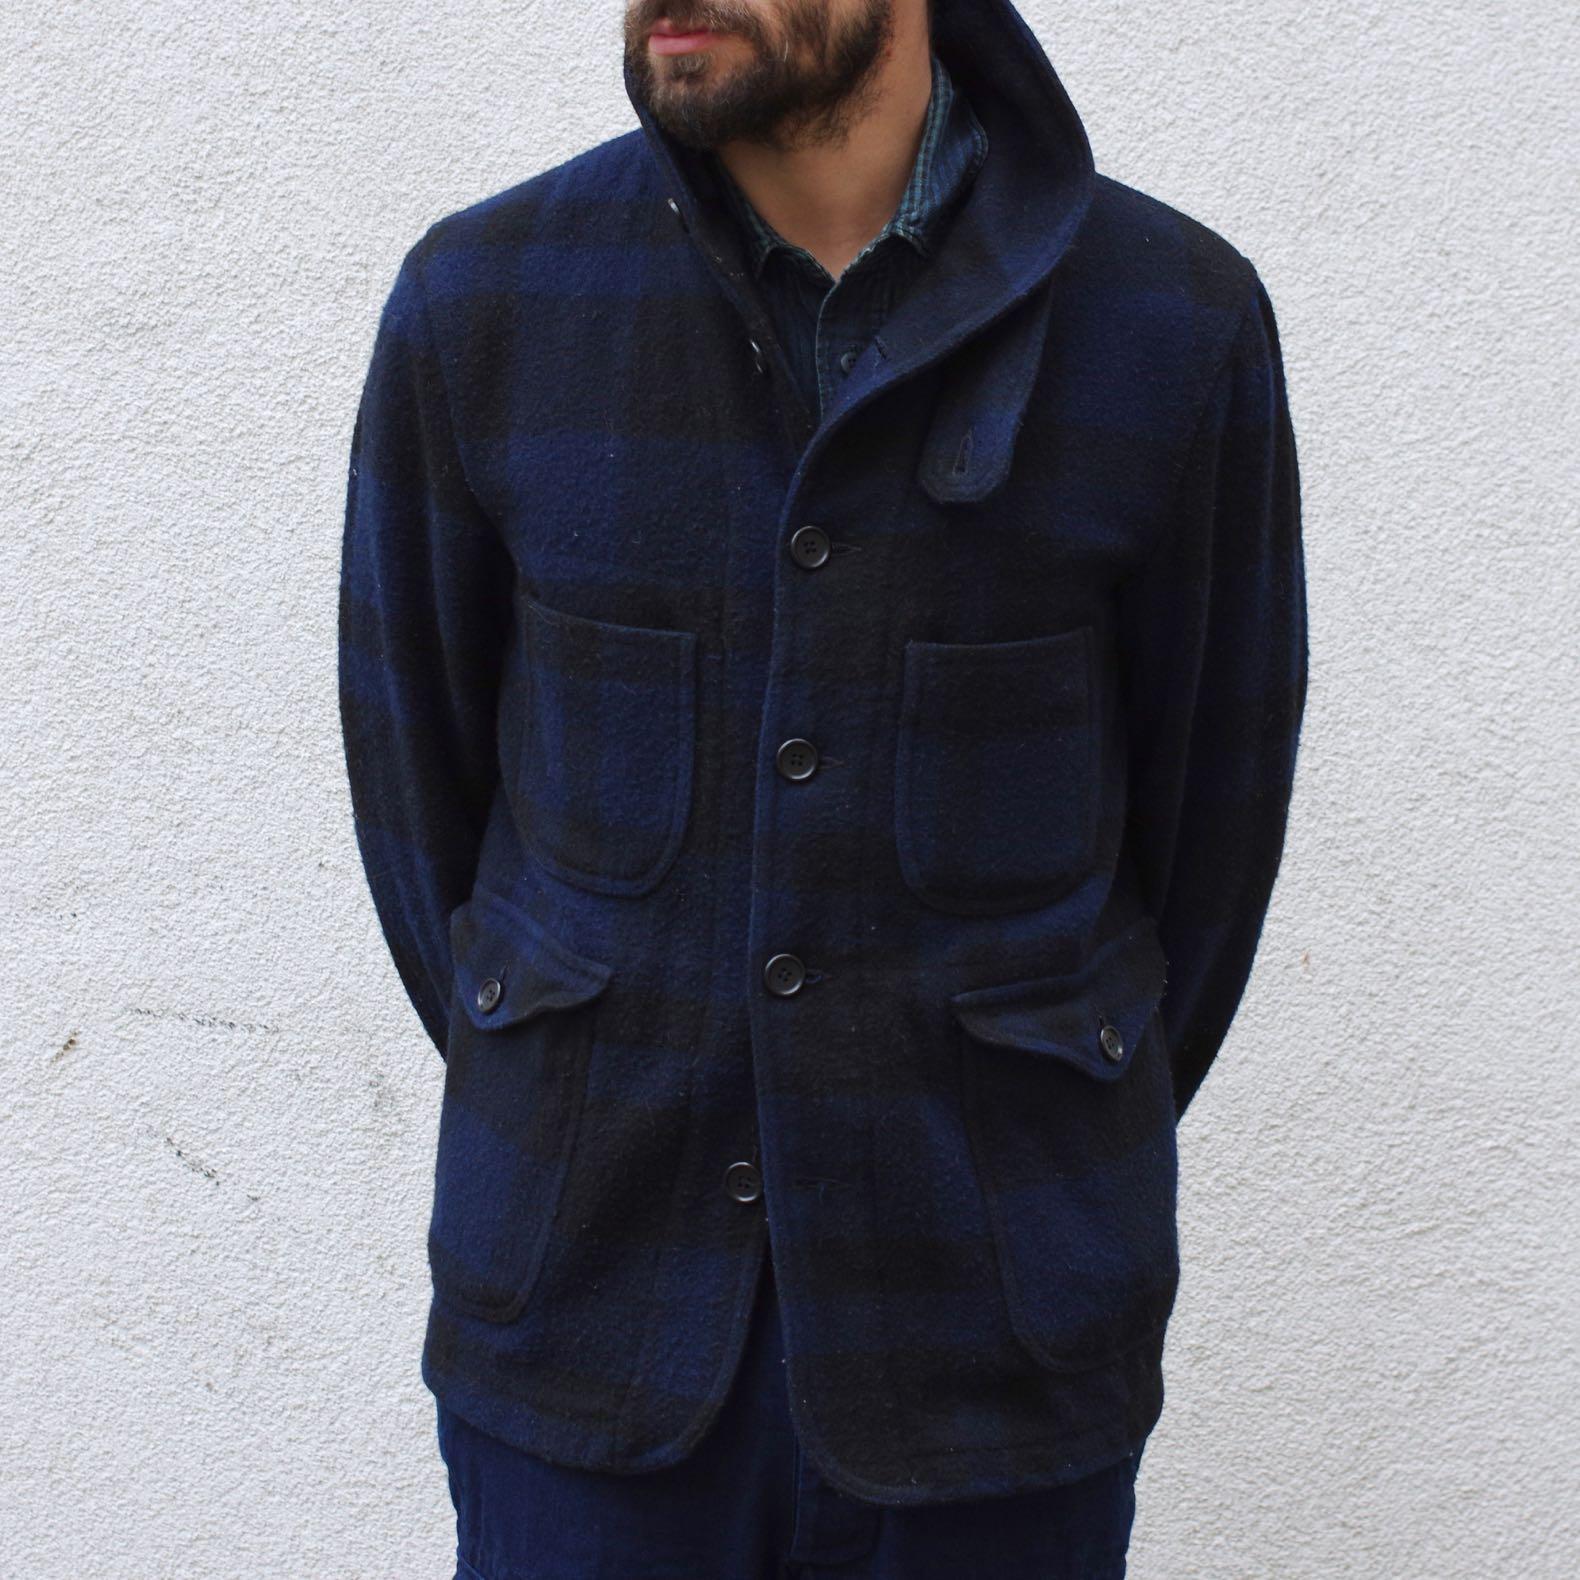 woolrich woolen mills main guide jacket black @ navy